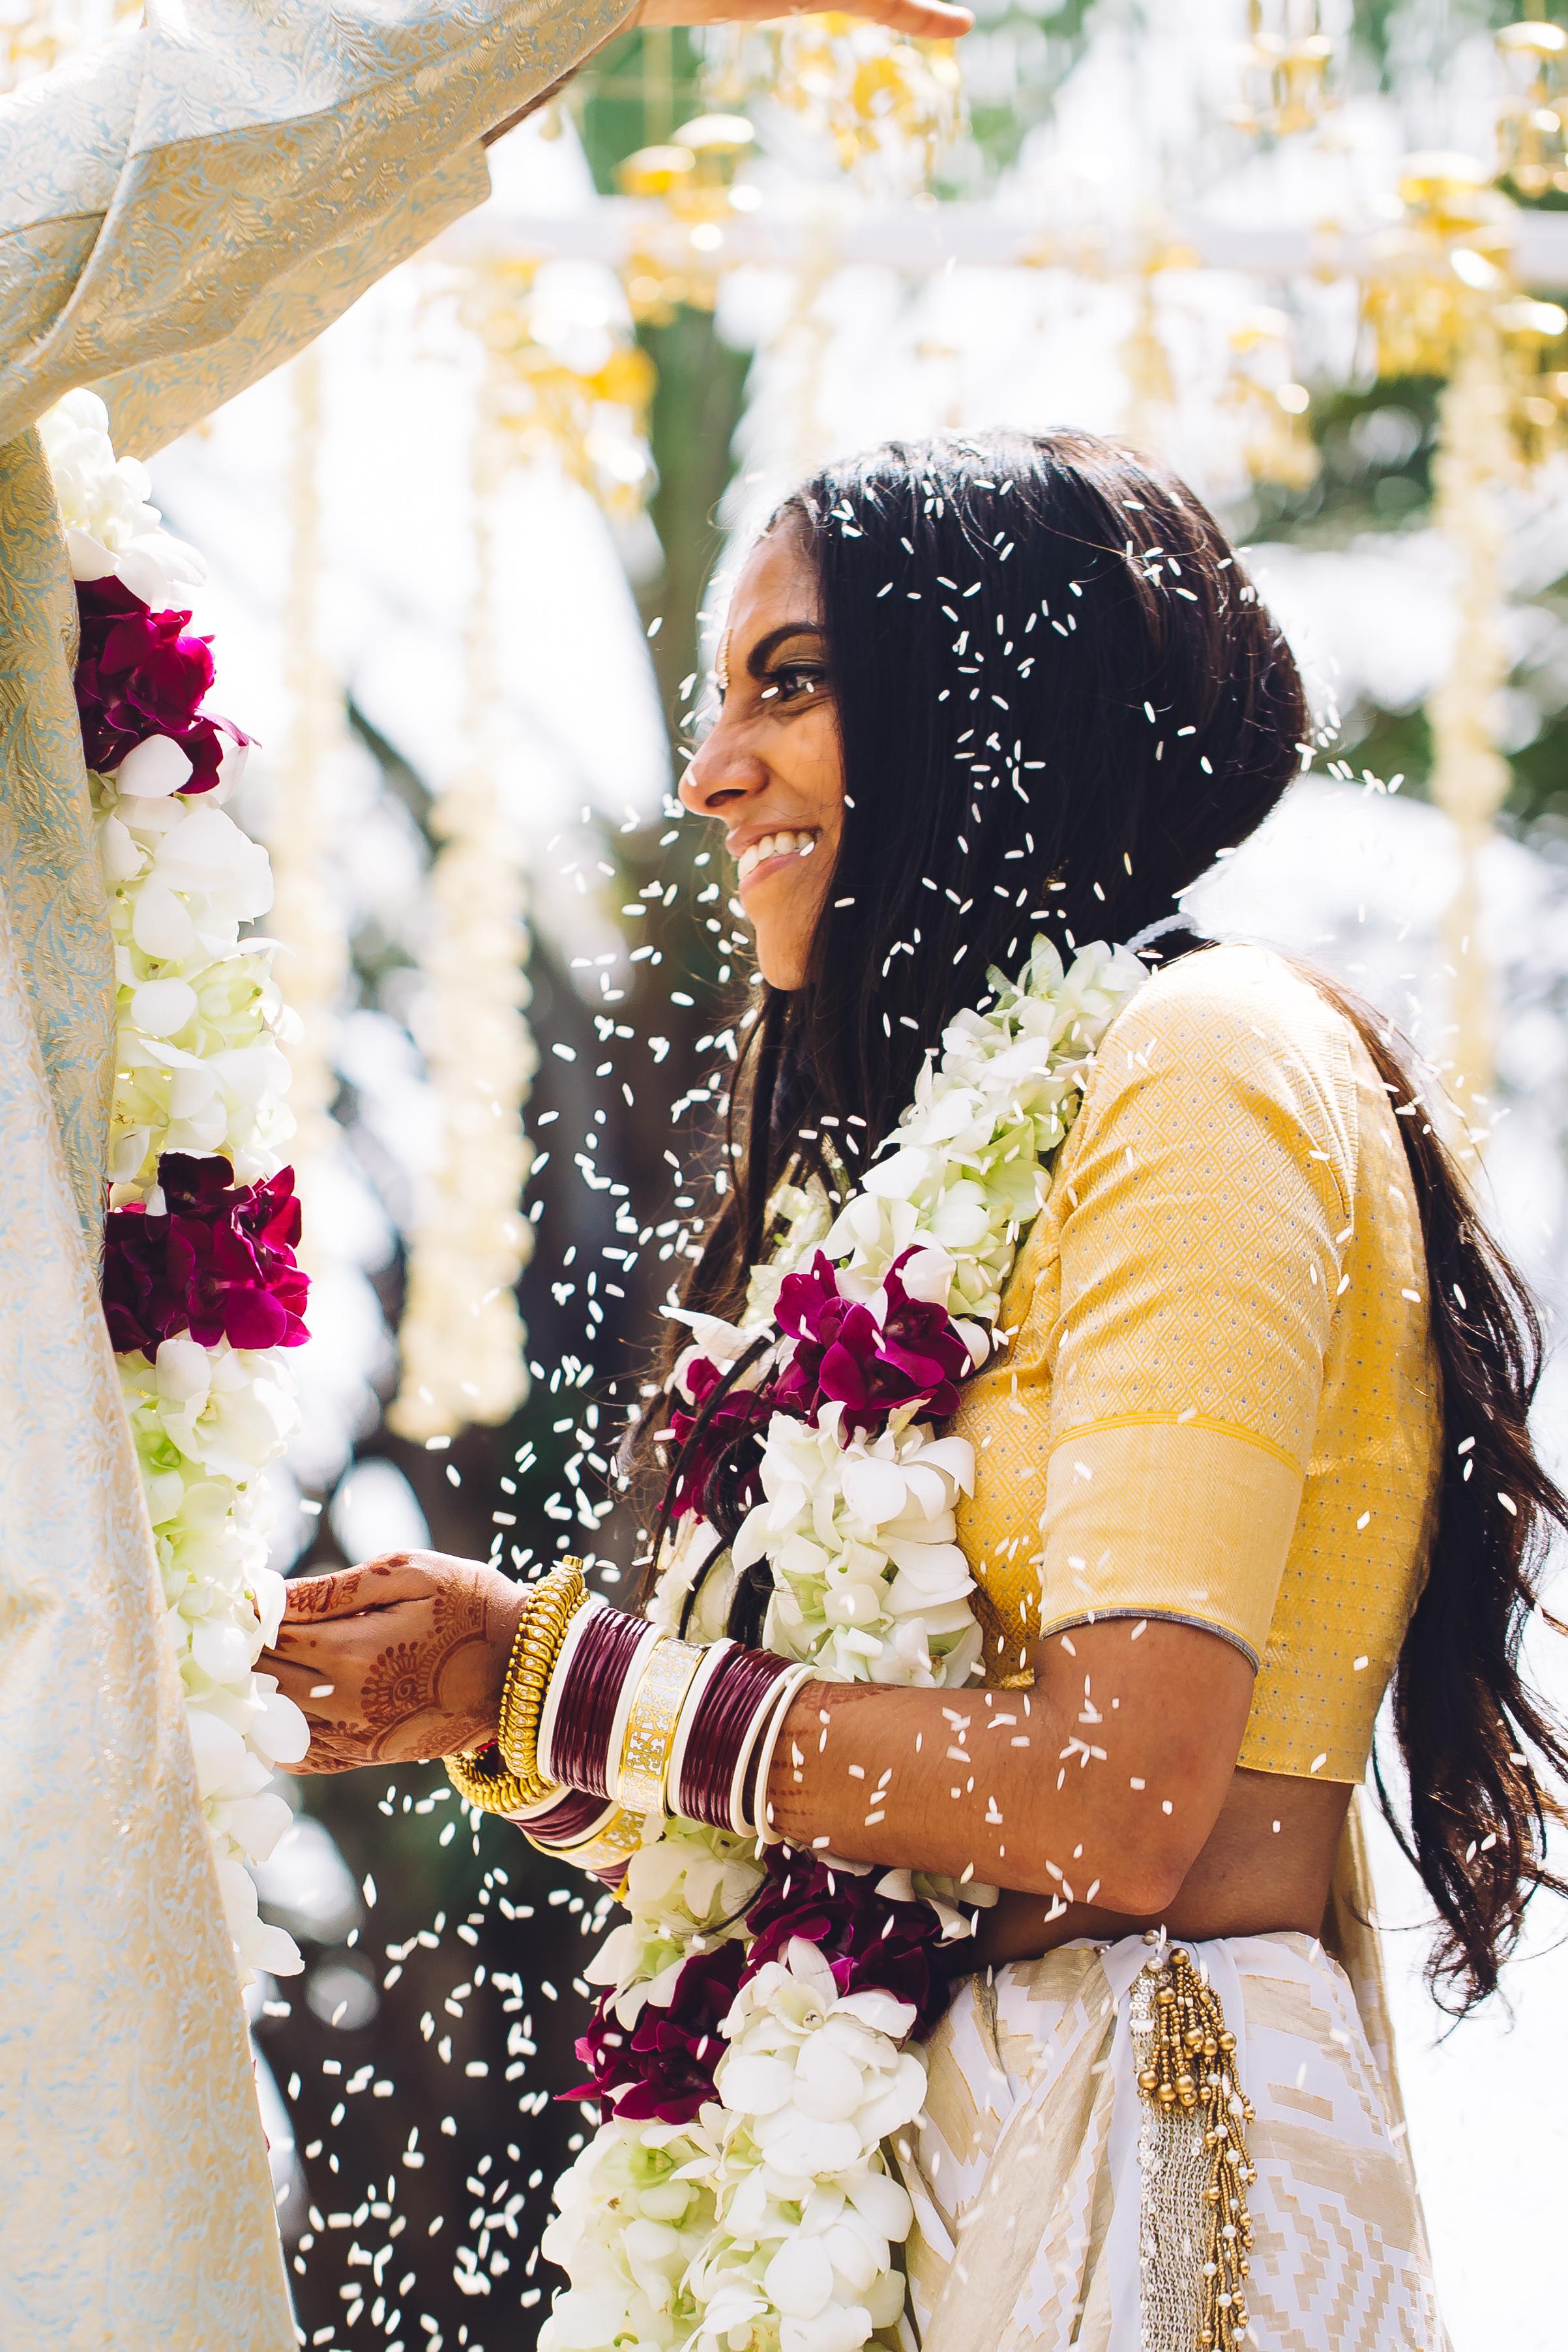 INDIAN WEDDING, CHARLESTON WEDDING, DESTINATION WEDDING, DESTINATION WEDDING PHOTOGRAPHERS, CHARLESTON WEDDING PHOTOGRAPHERS